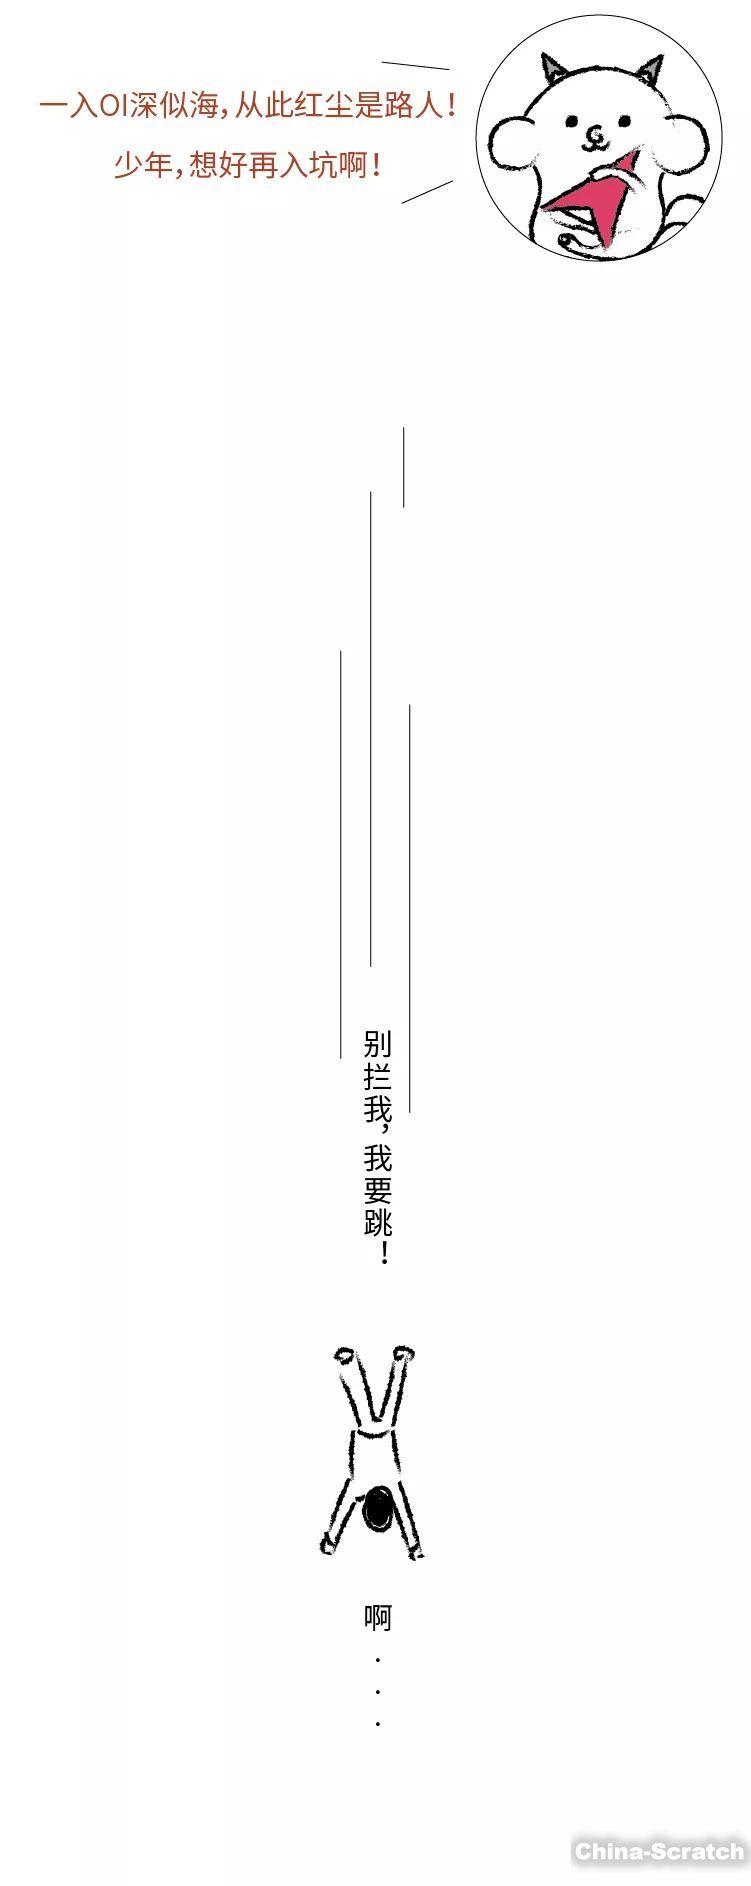 http://www.china-scratch.com/Uploads/timg/190520/1K5226057-5.jpg